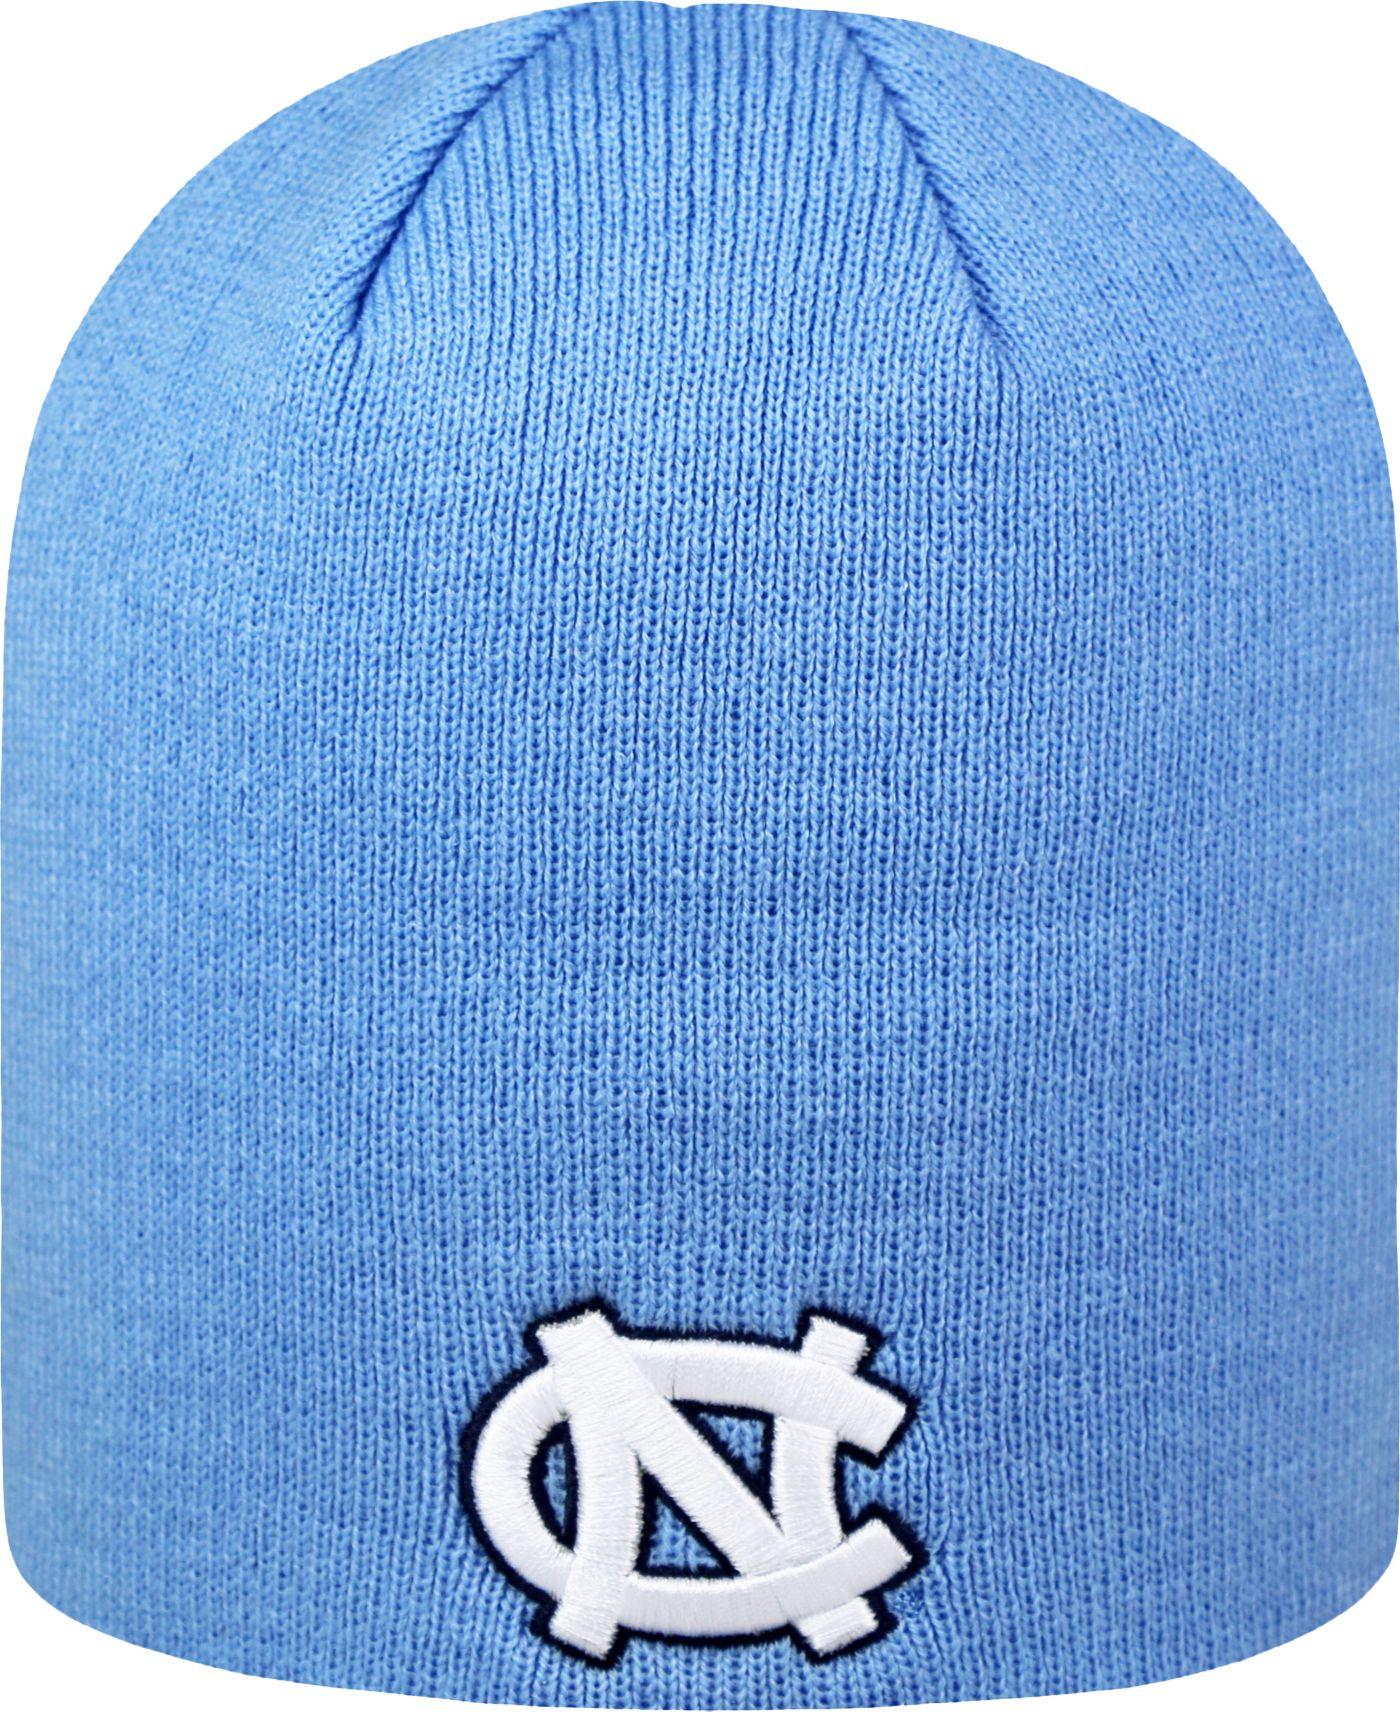 Top of the World Men's North Carolina Tar Heels Carolina Blue TOW Classic Knit Beanie